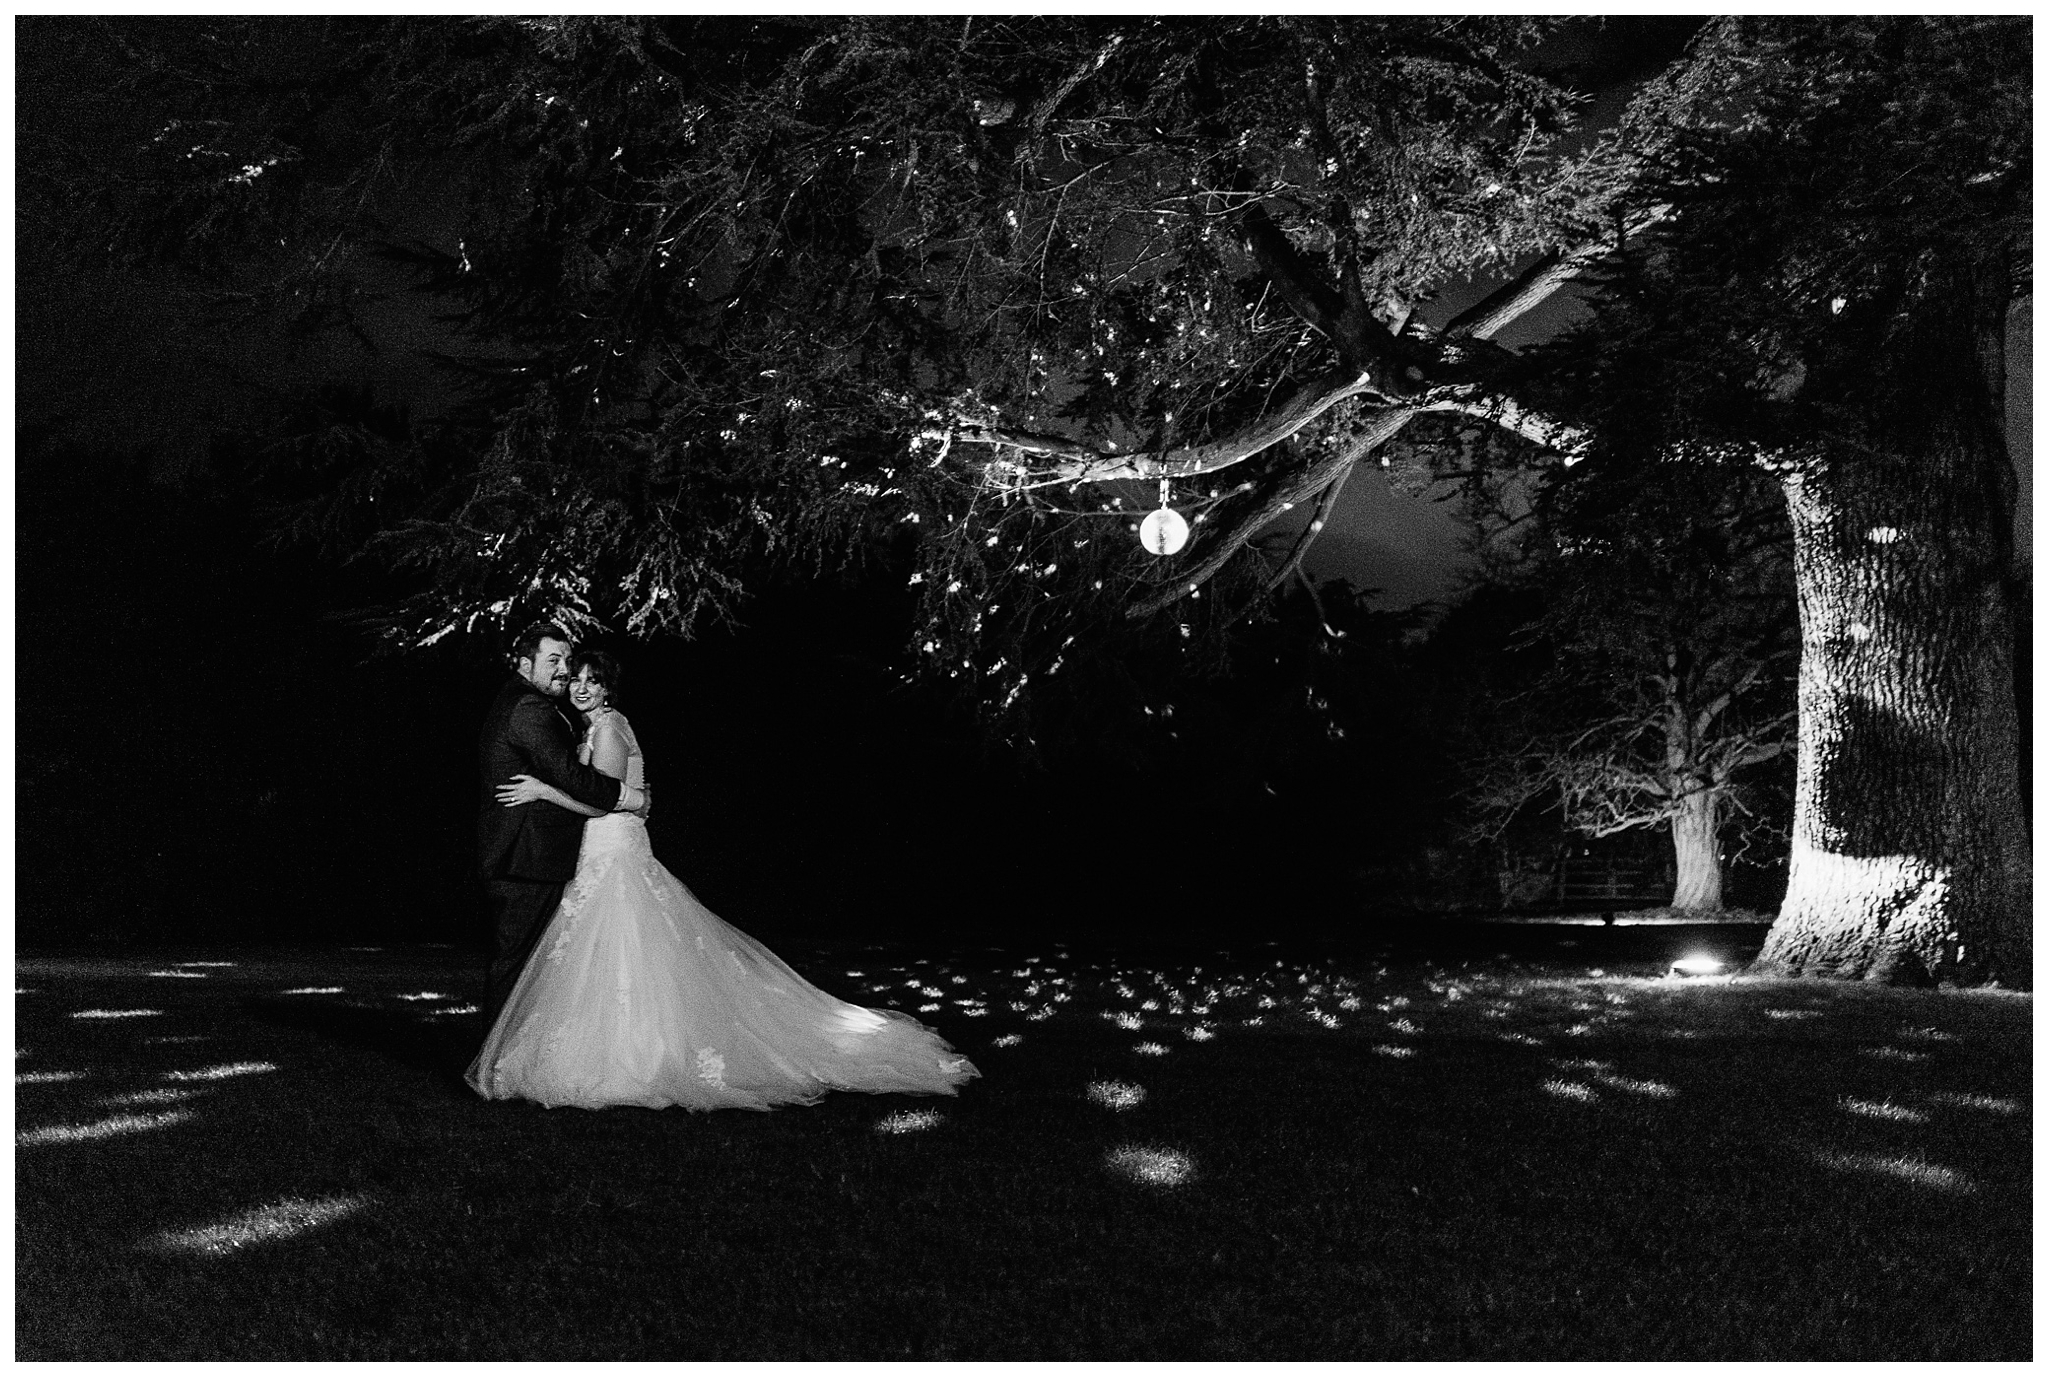 Emma&Paul-Elmore-Court-Winter-Wedding-Nikki-Cooper-Photography_0111.jpg